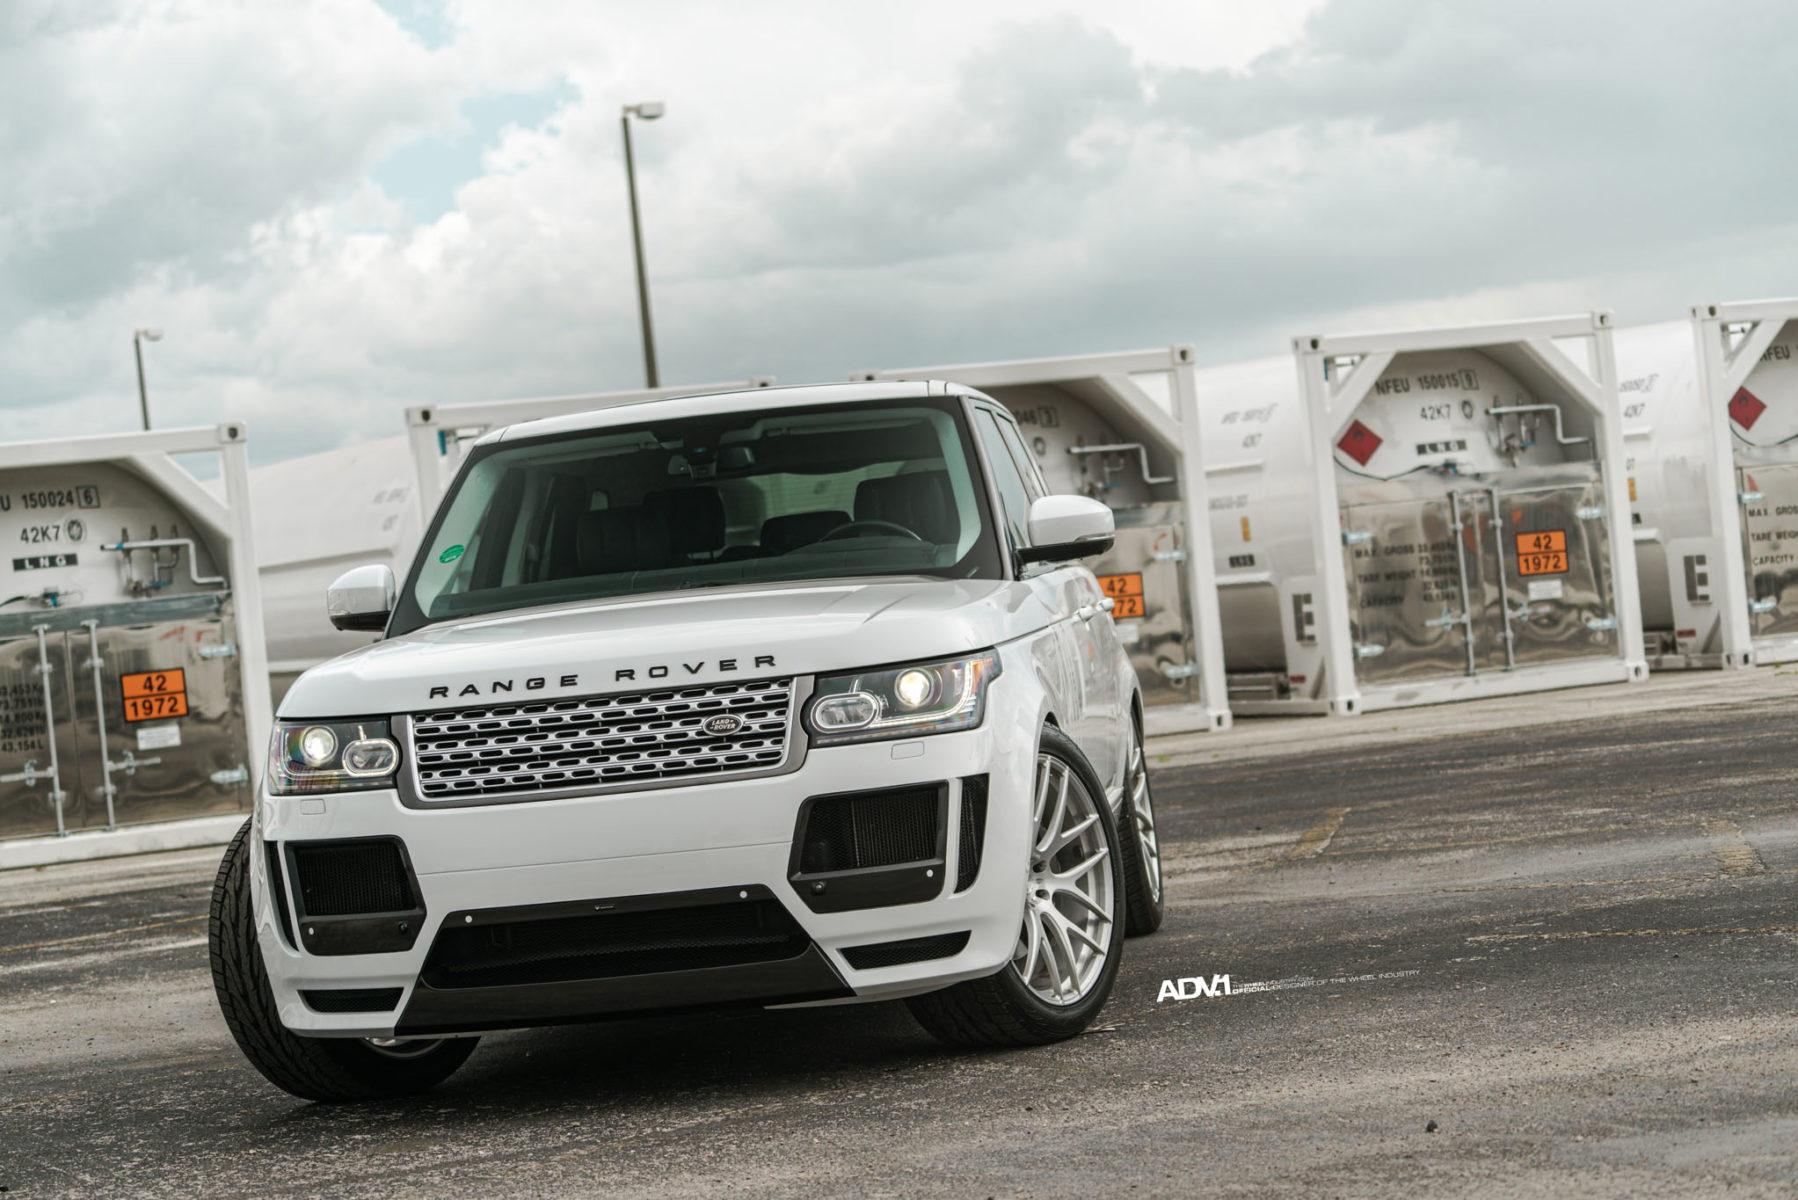 White Range Rover HSE ADV7 M V1 Standard Wheels ADV 1 Wheels